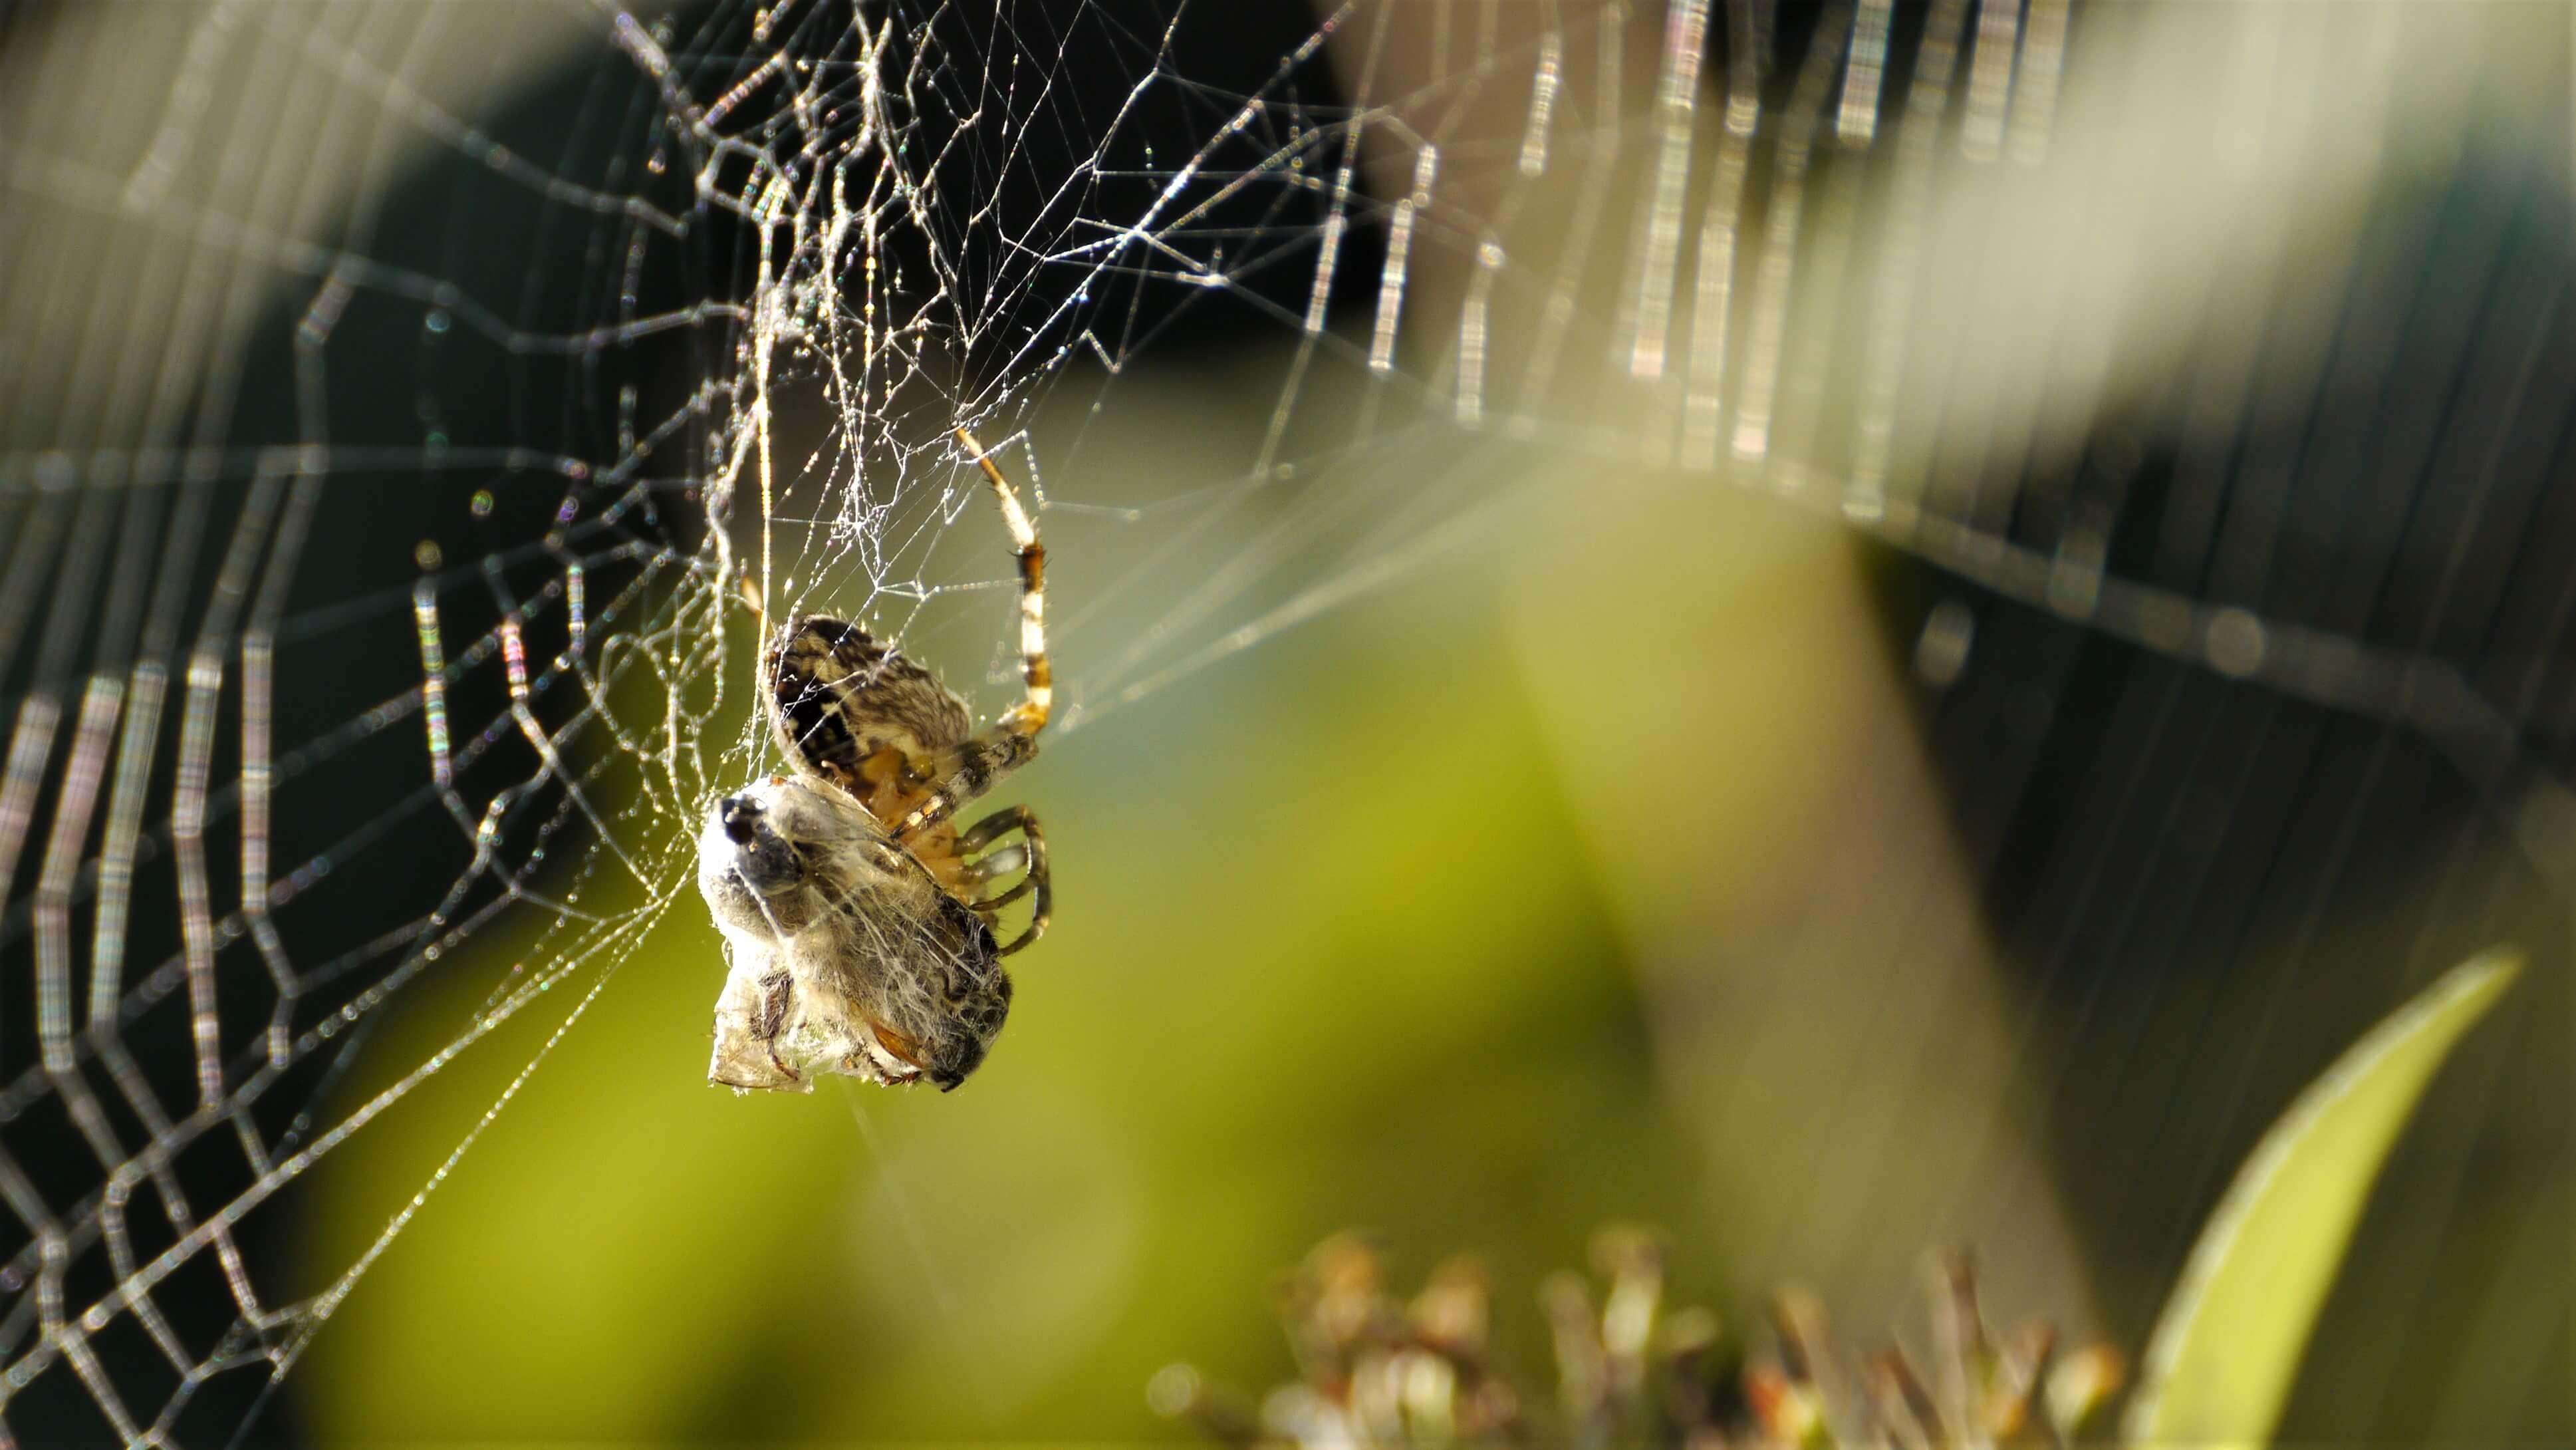 Kruisspin met prooi spinnenfotografie